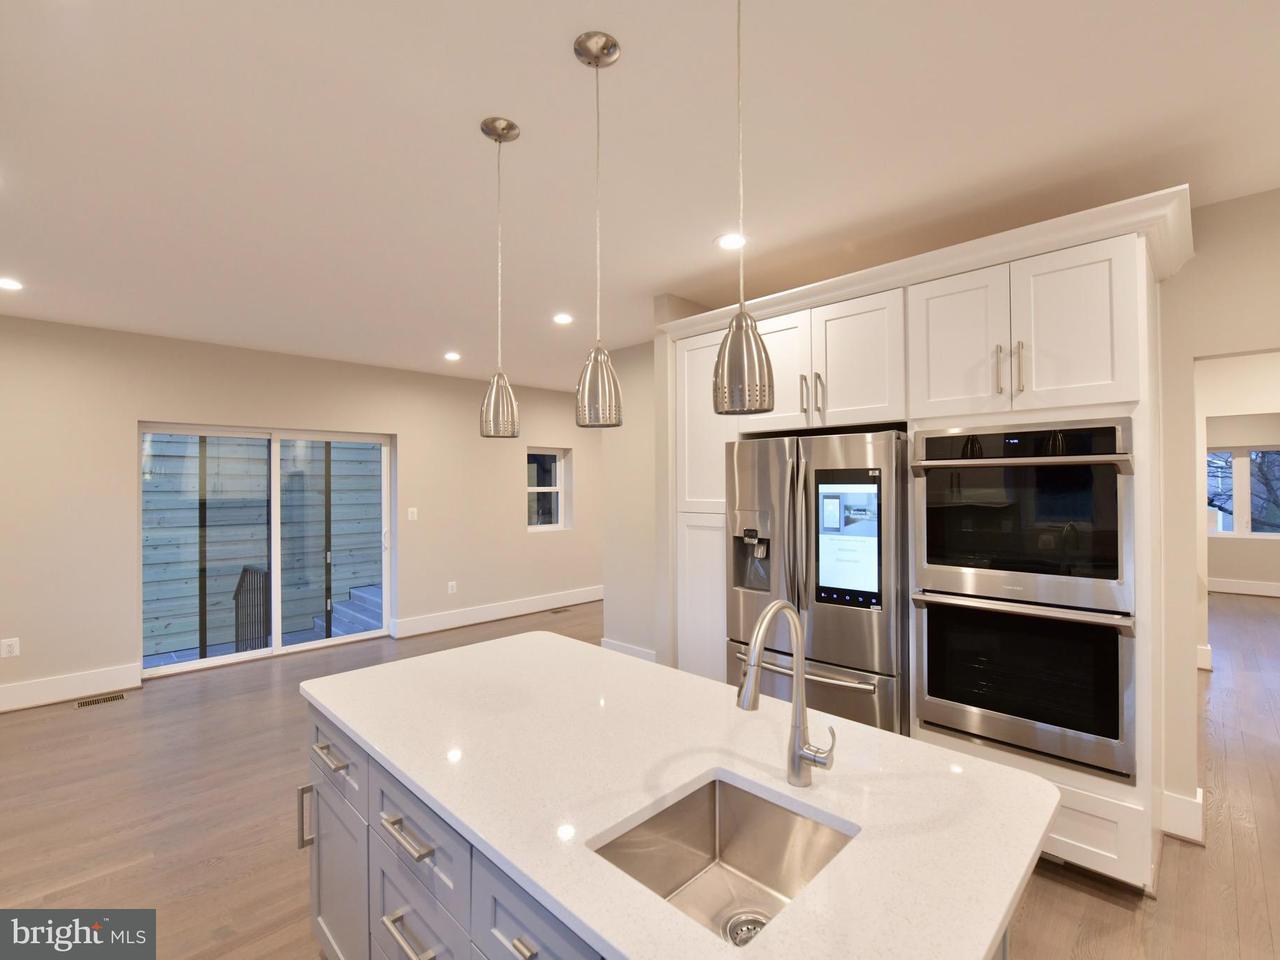 Additional photo for property listing at 213 W Greenway Blvd 213 W Greenway Blvd Falls Church, Virginia 22046 Estados Unidos